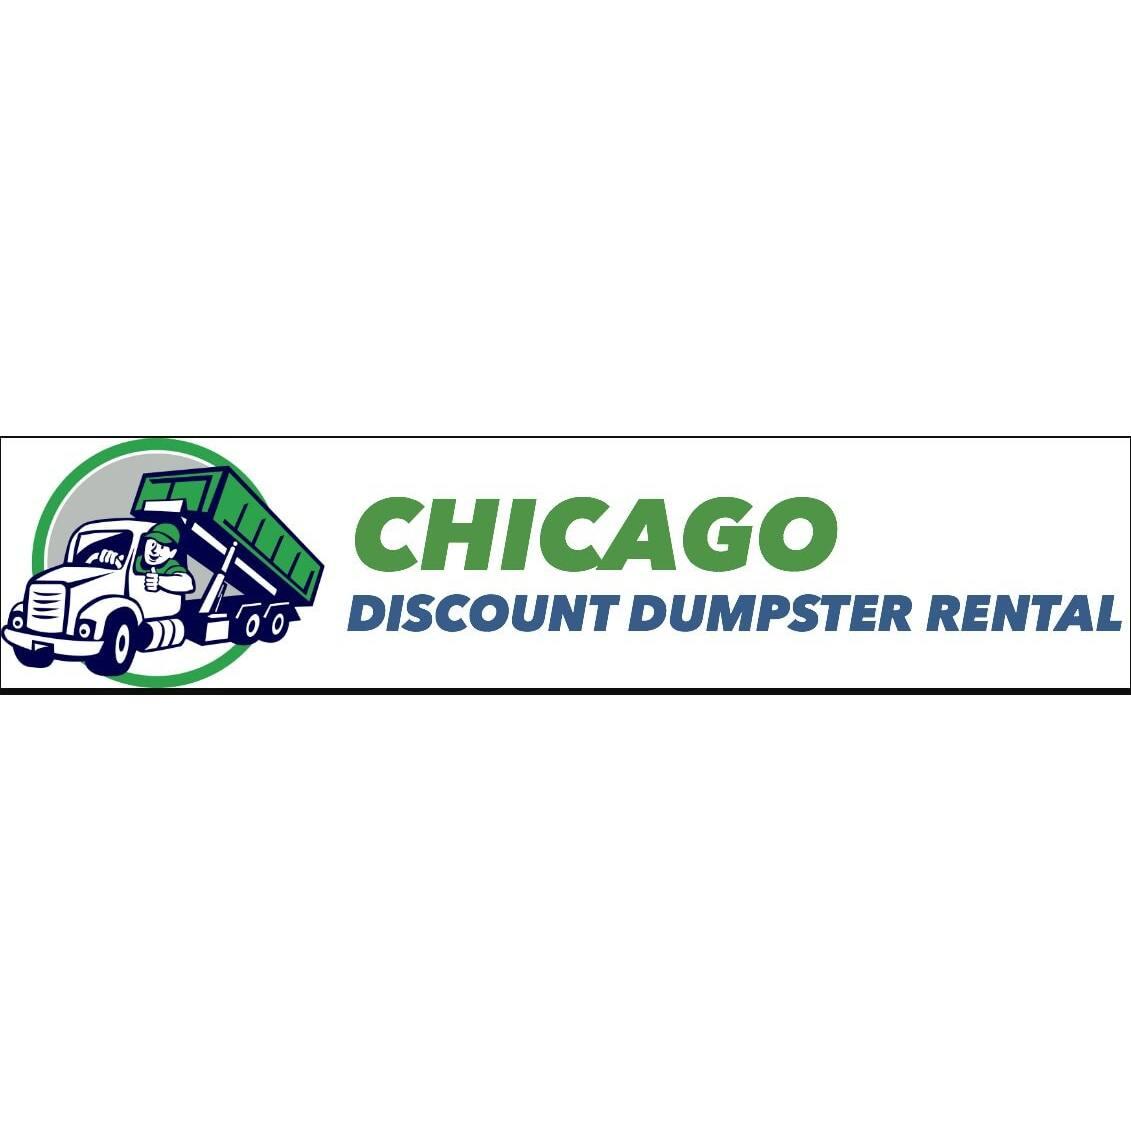 Discount Dumpster Rental Chicago